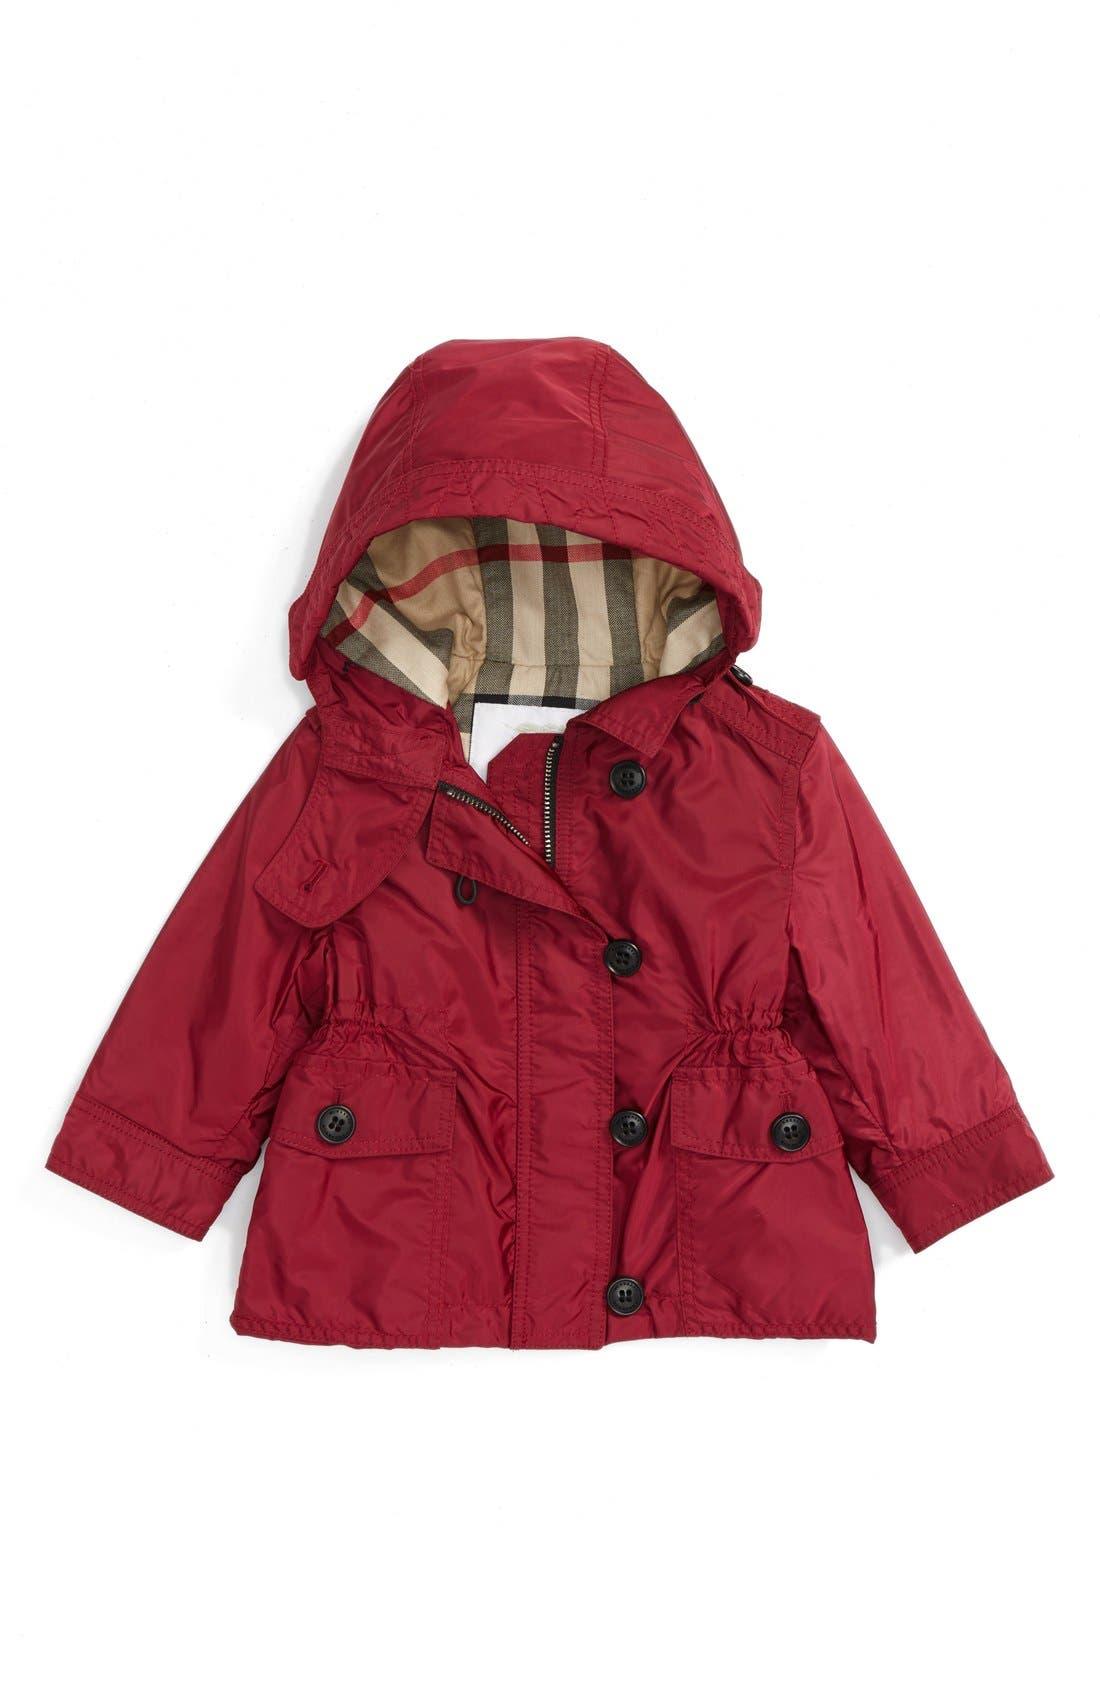 Main Image - Burberry 'Karen' Hooded Jacket (Baby Girls)